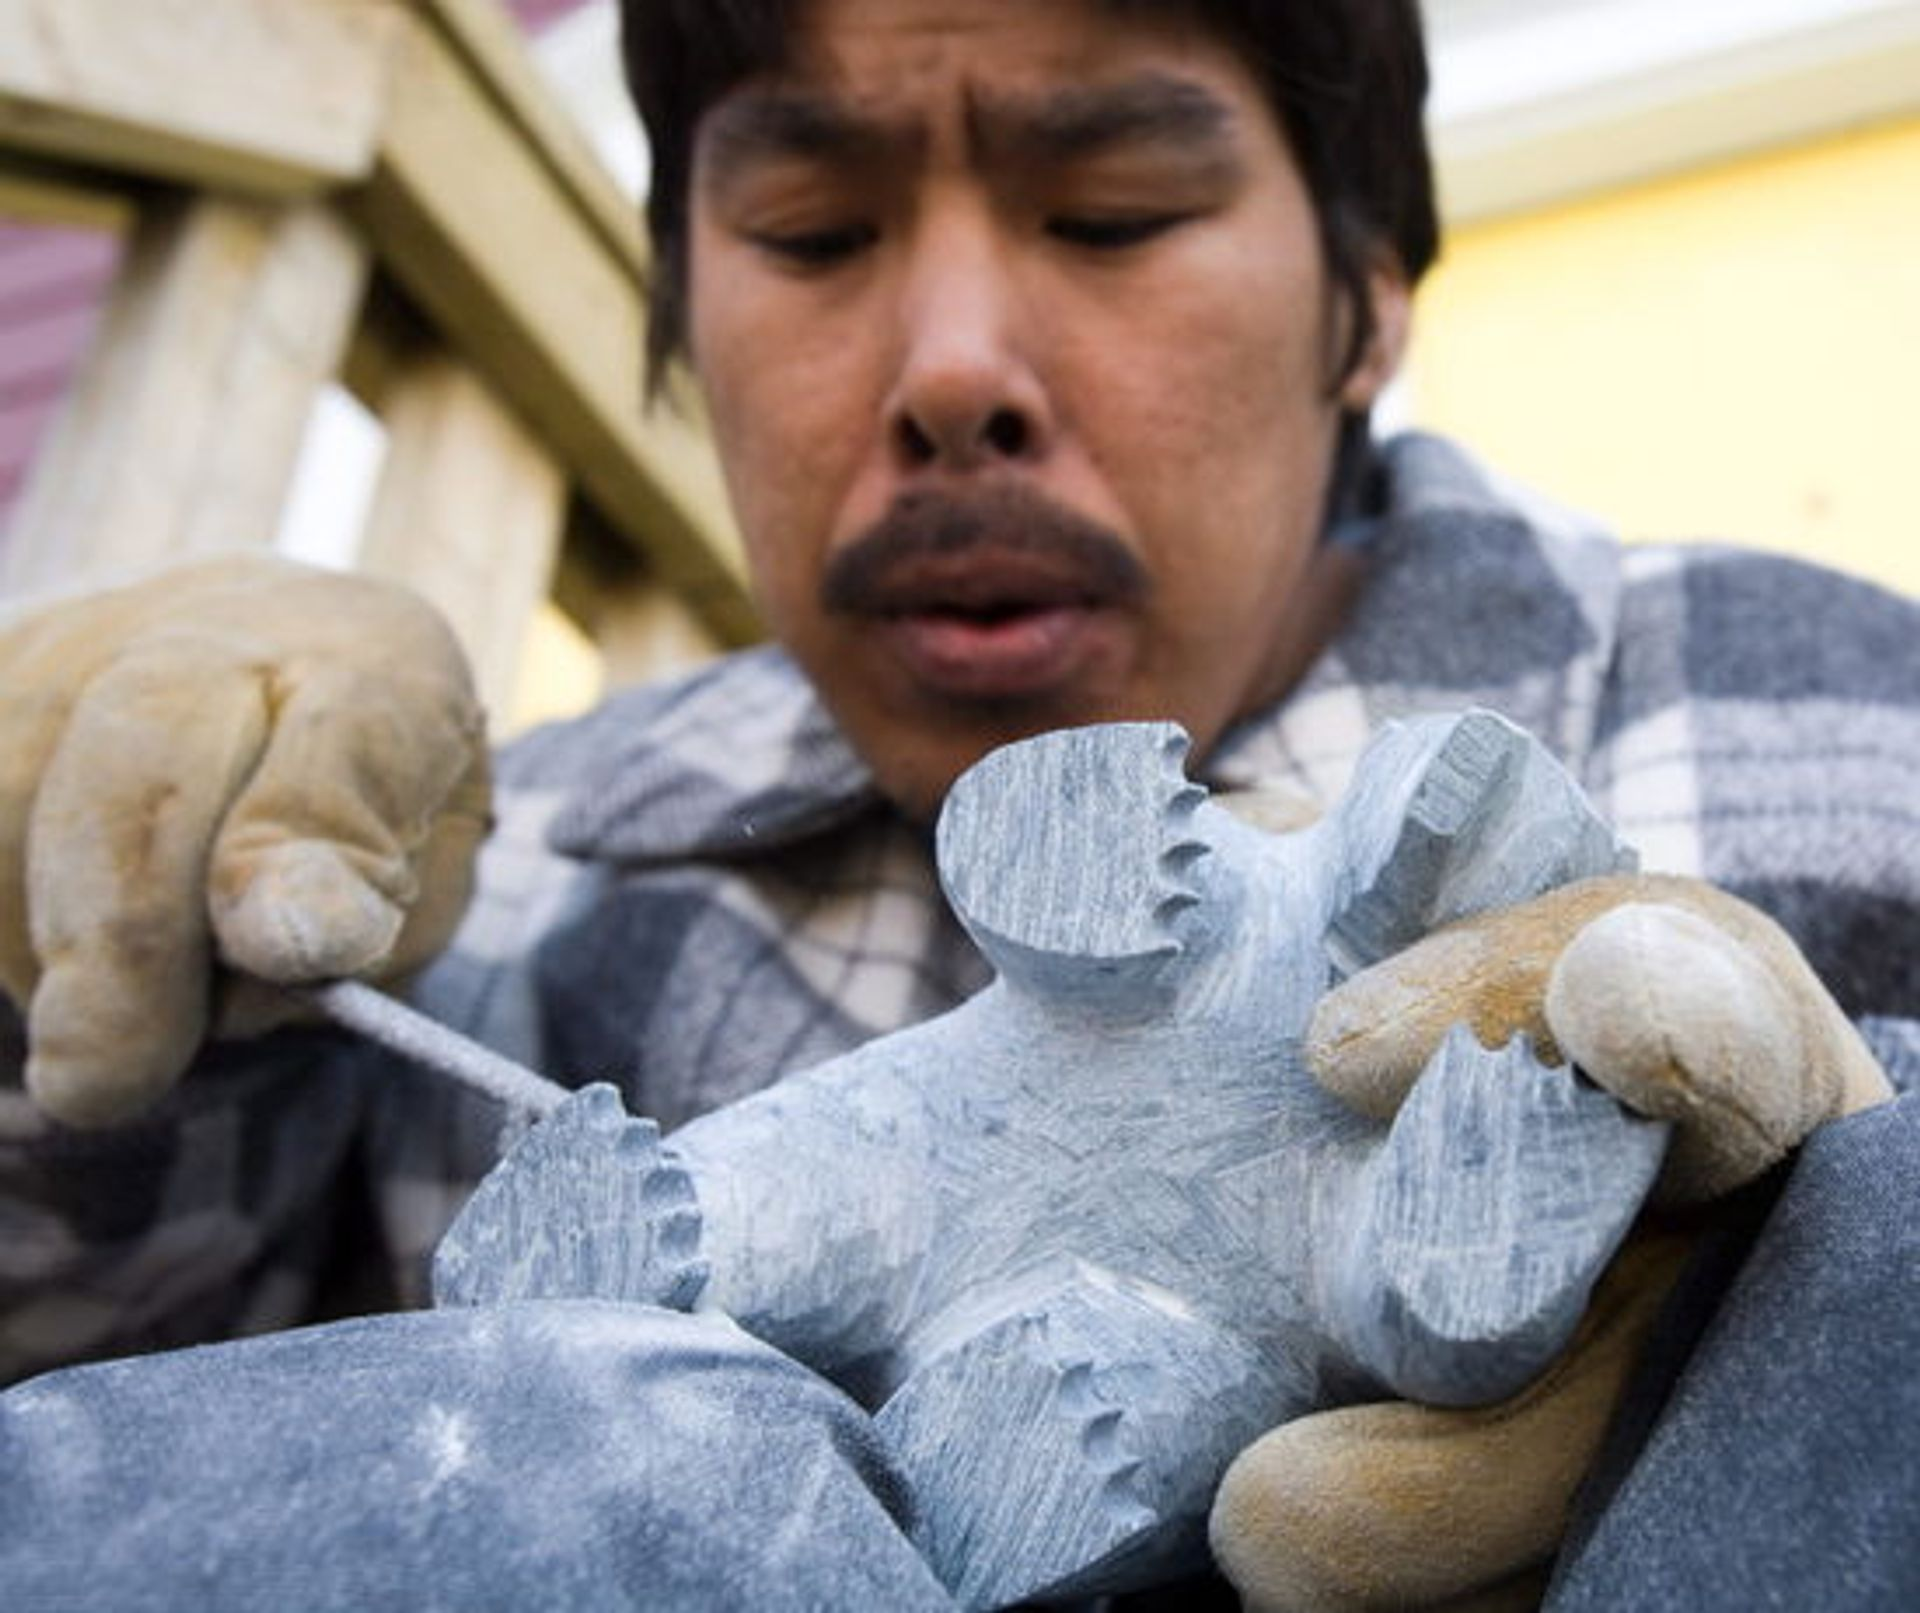 Inuit stone carver Ali Riaq of Cape Dorset works on a polar bear in Iqaluit, Nunavut. Canadian Press/Shutterstock